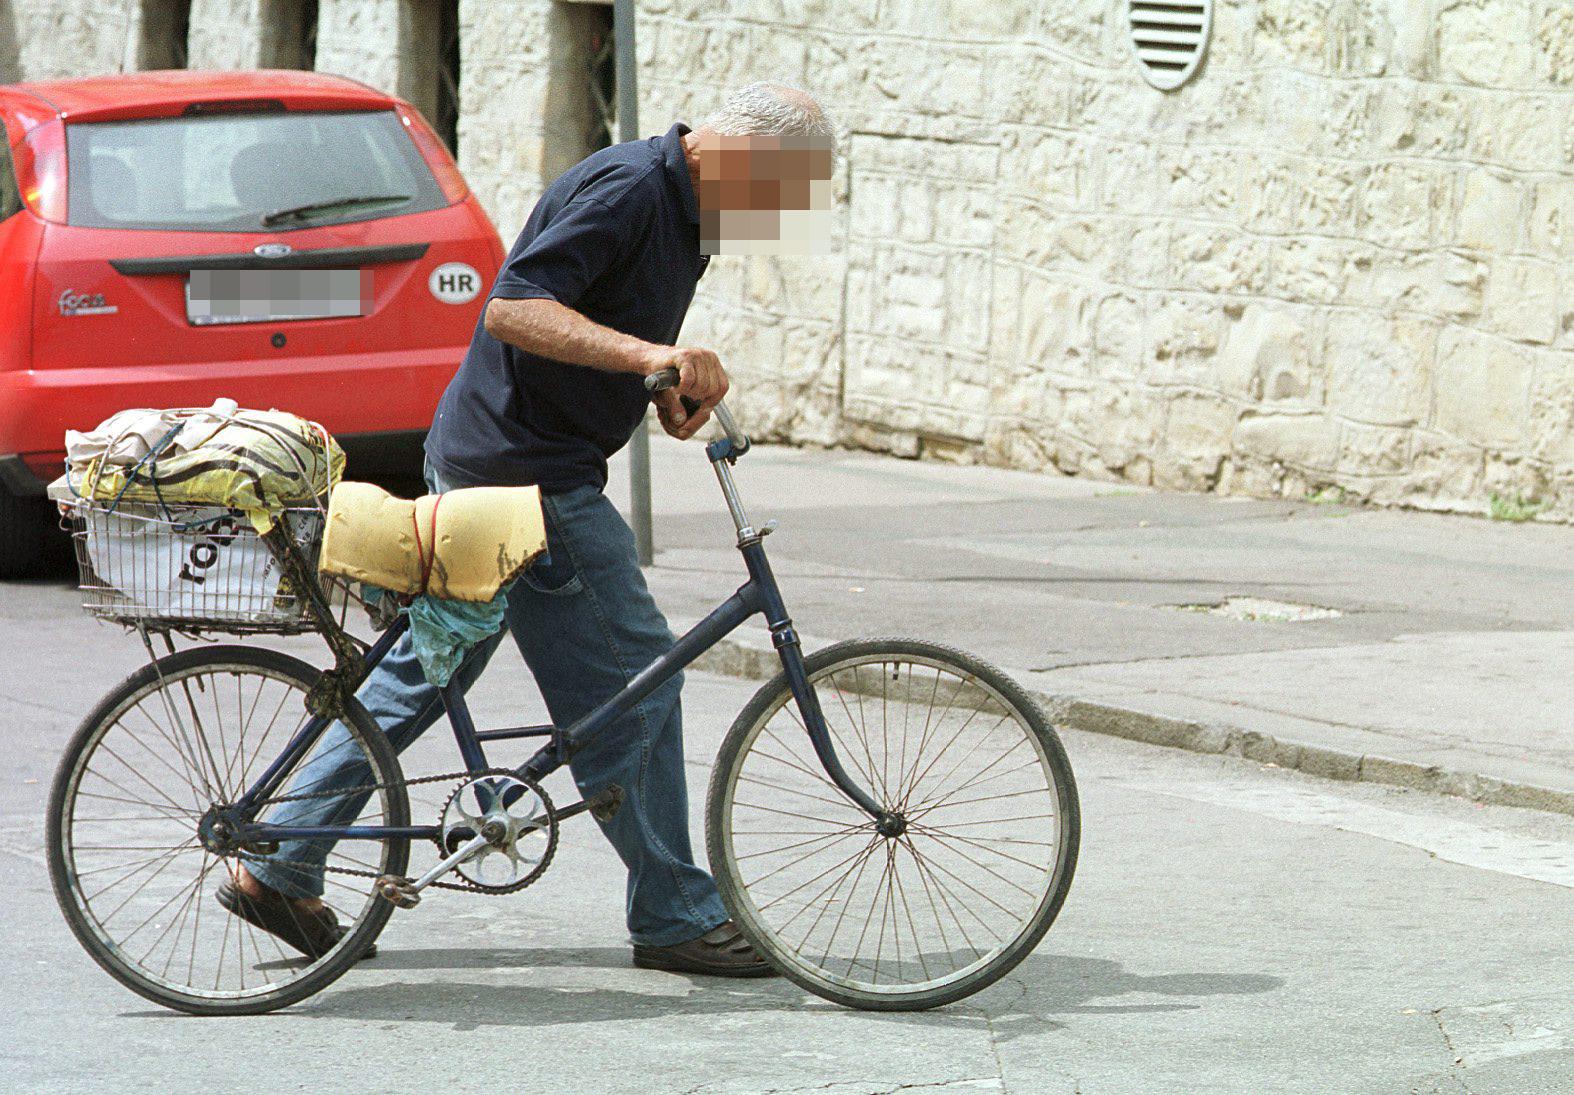 Biciklist, Ilustracija